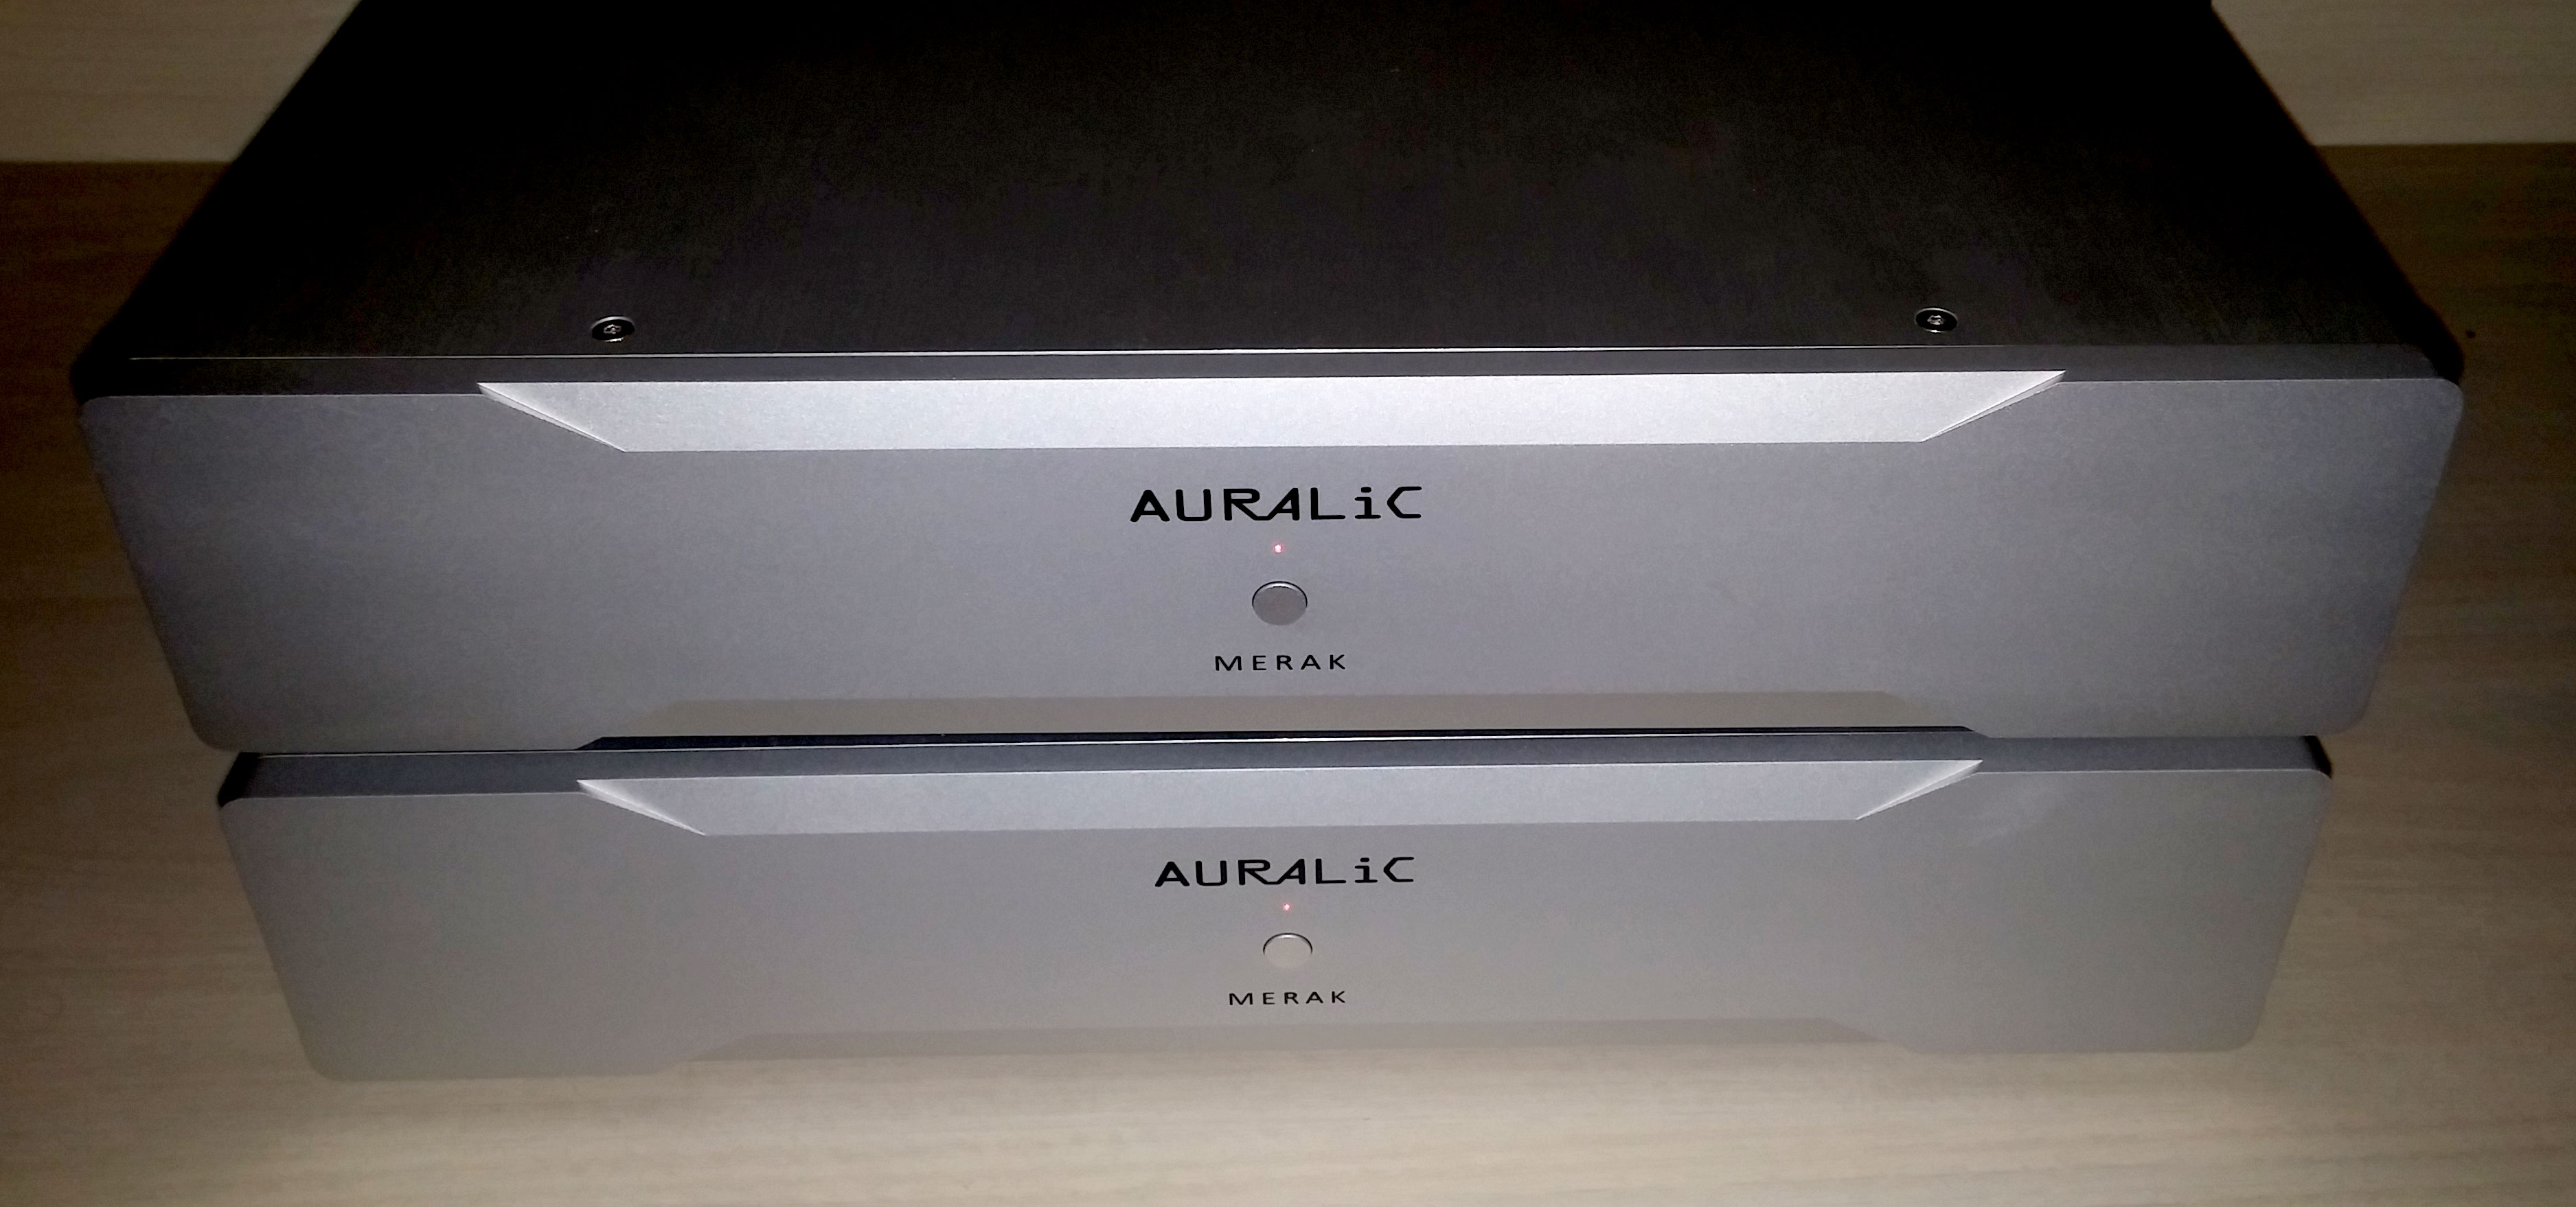 AURALiC Taurus Review | AURALiC MERAK Review